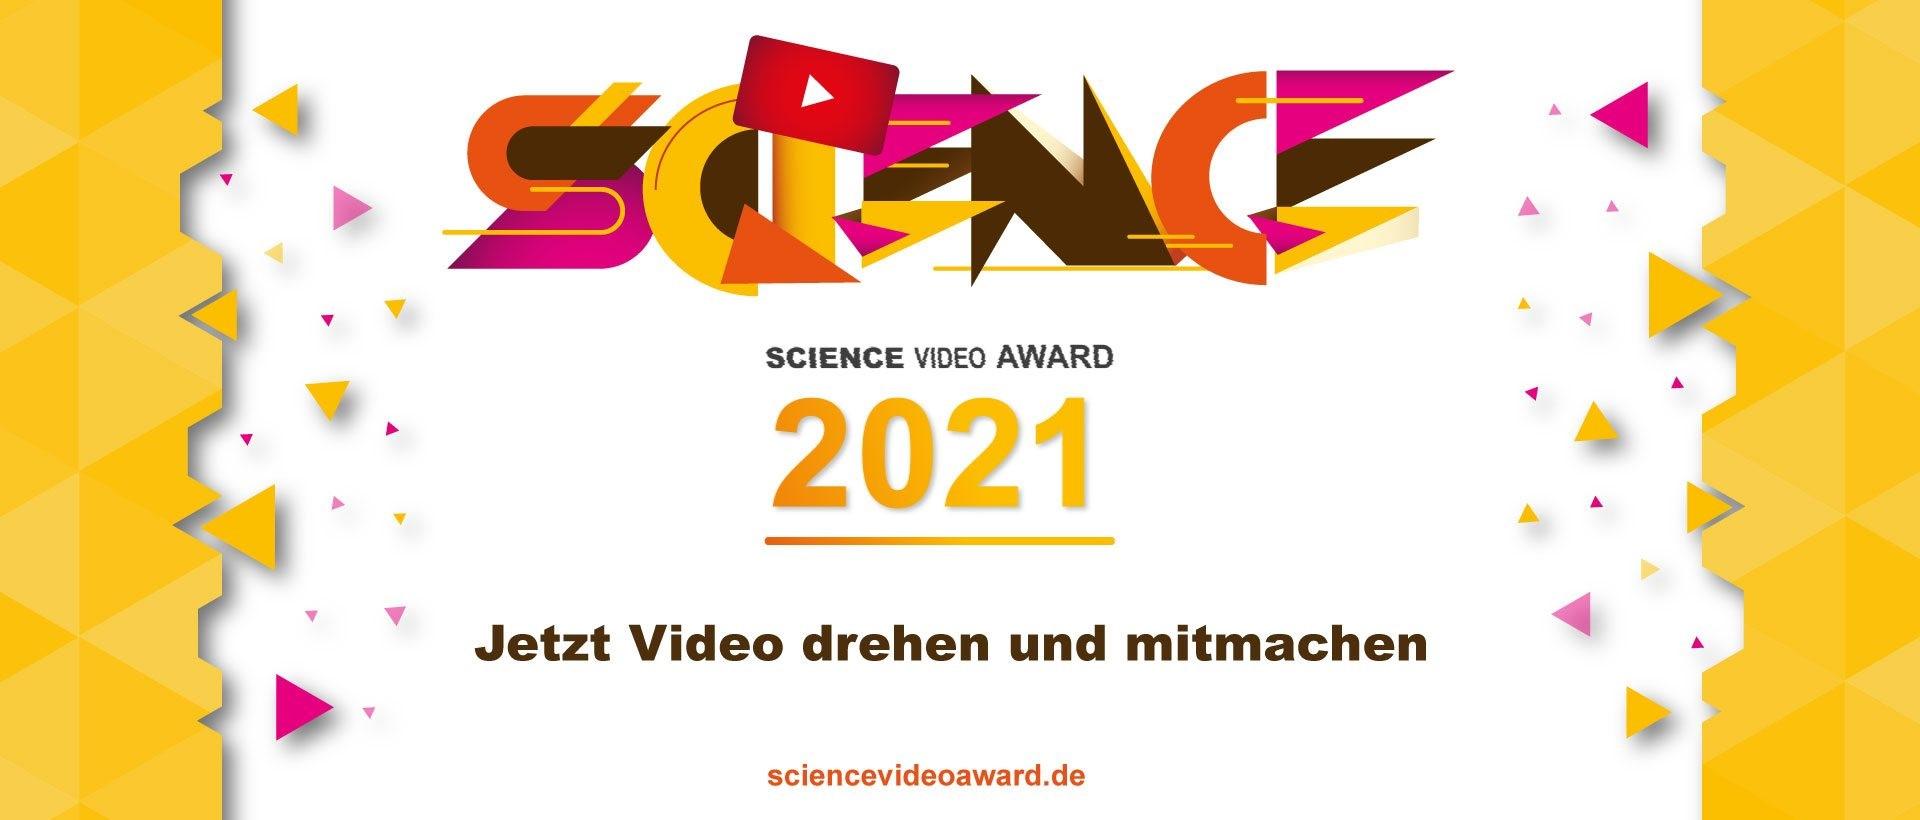 zdi-Video-Award 2021